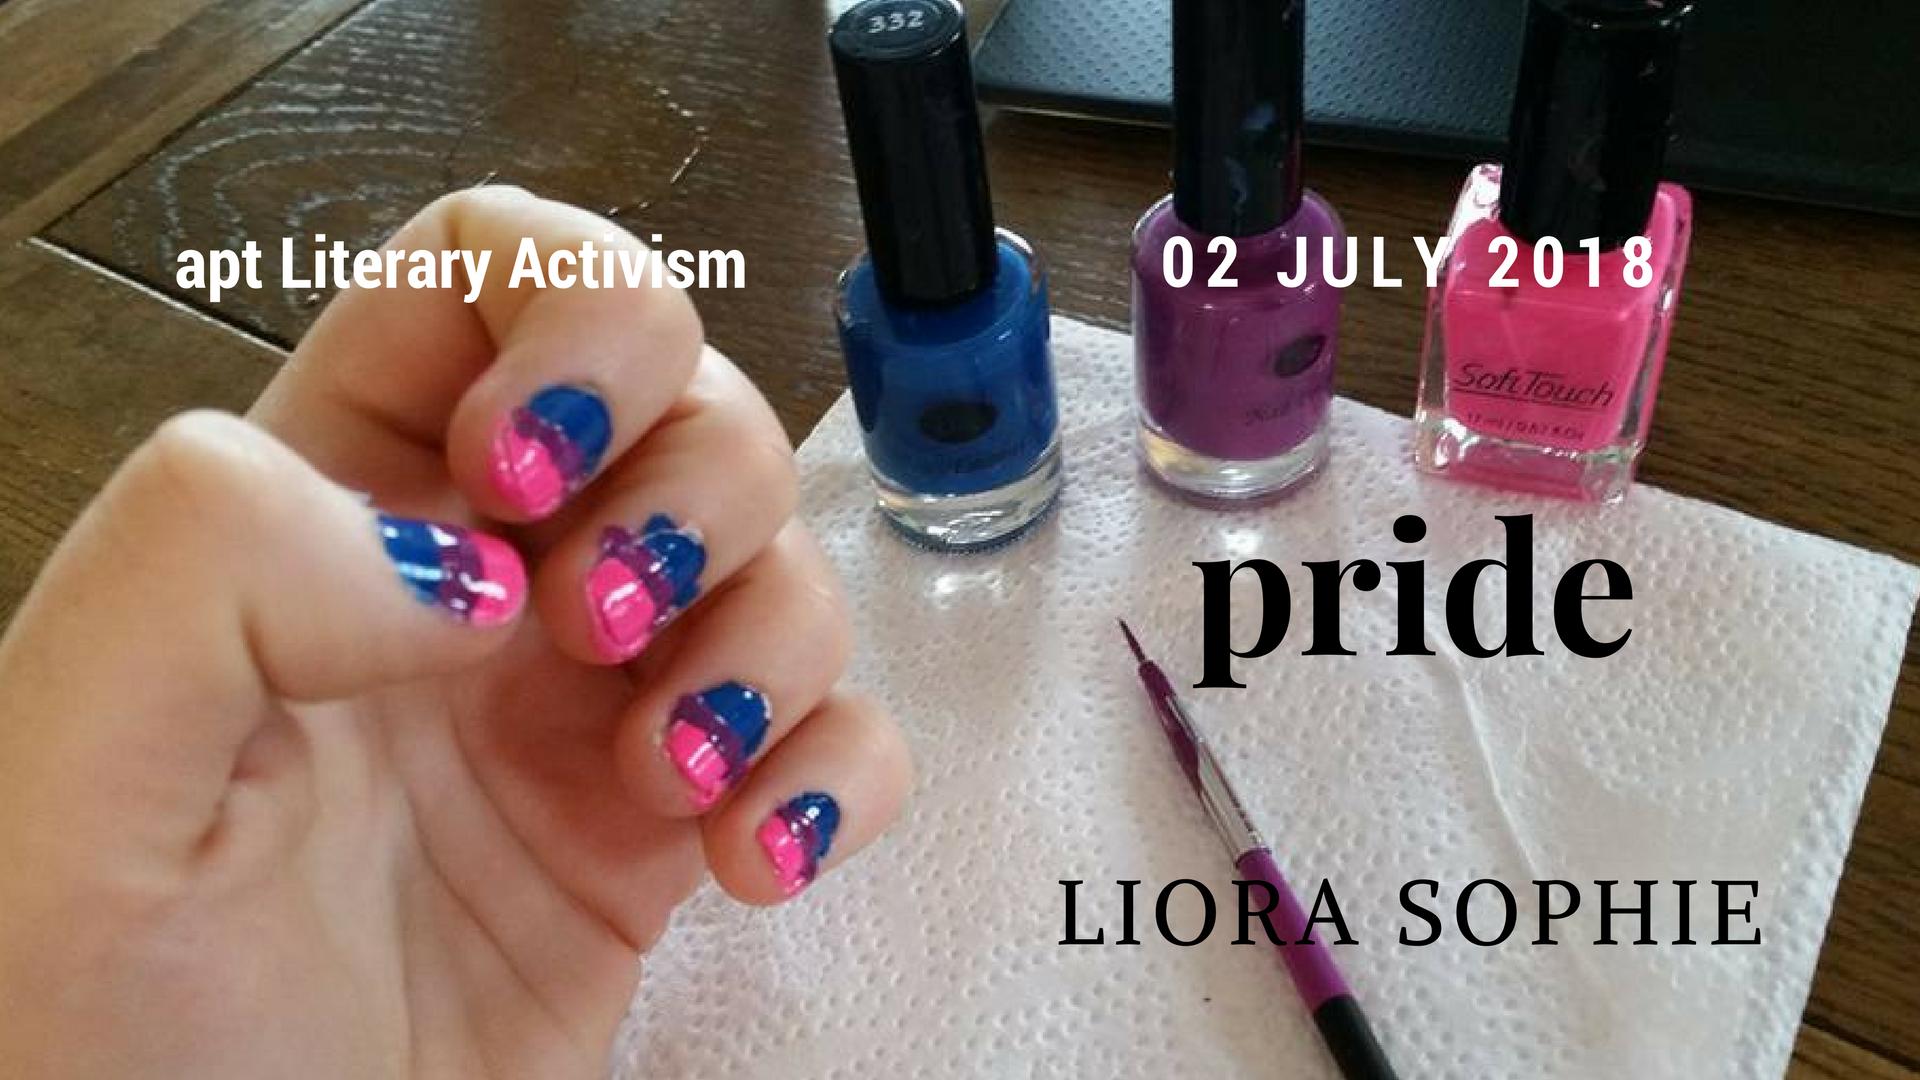 Pride by Liora Sophie